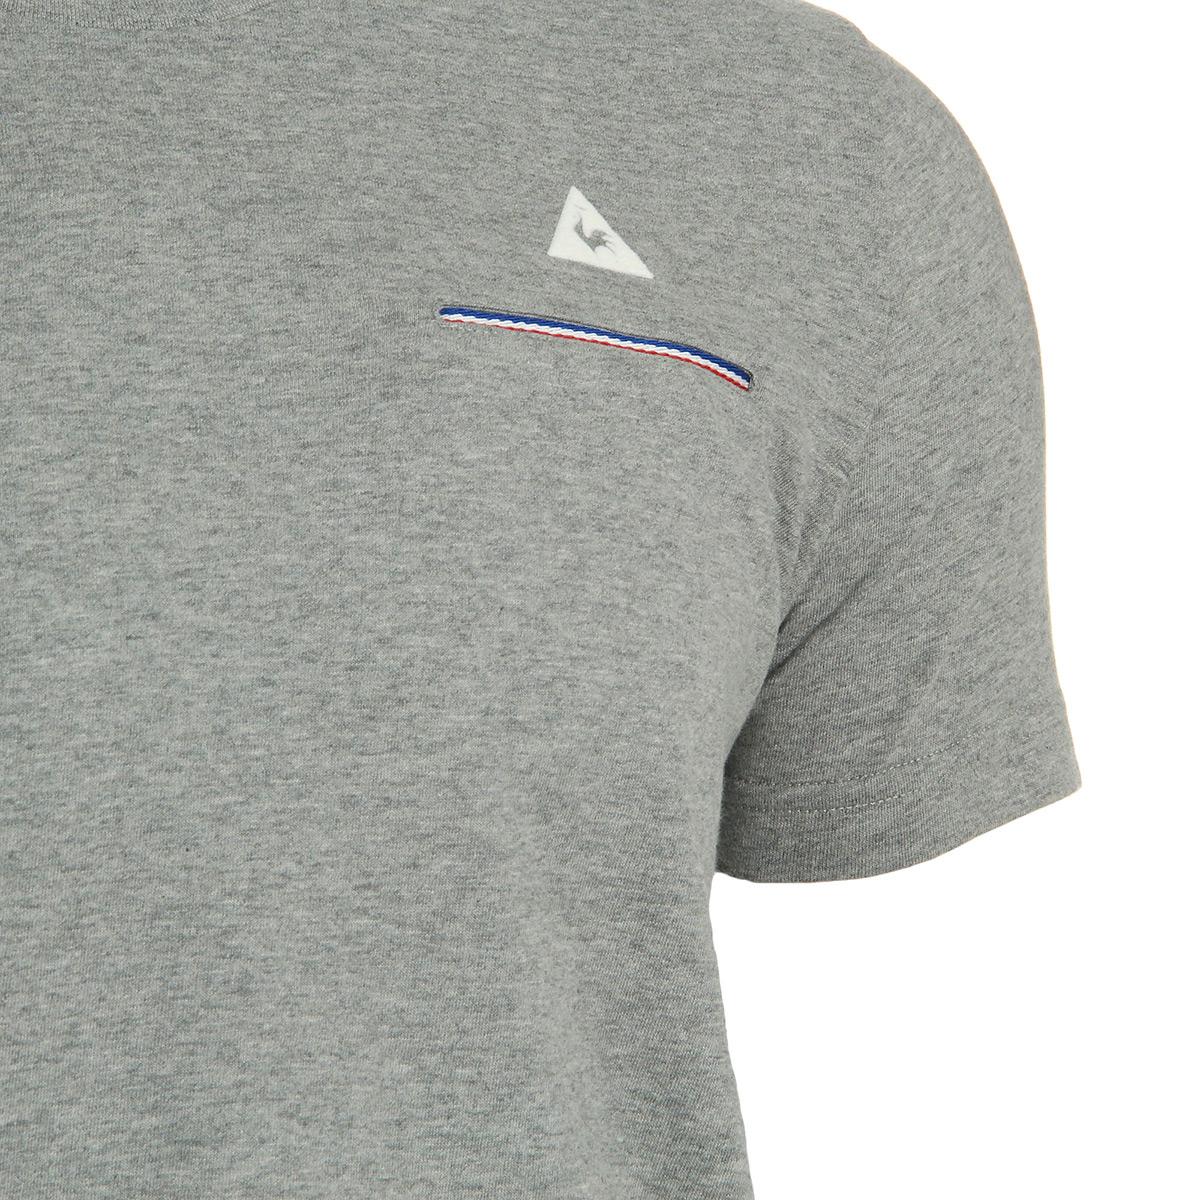 Le Coq Sportif Fluorin Tee SS M Light Grey 1610077, T-Shirts homme